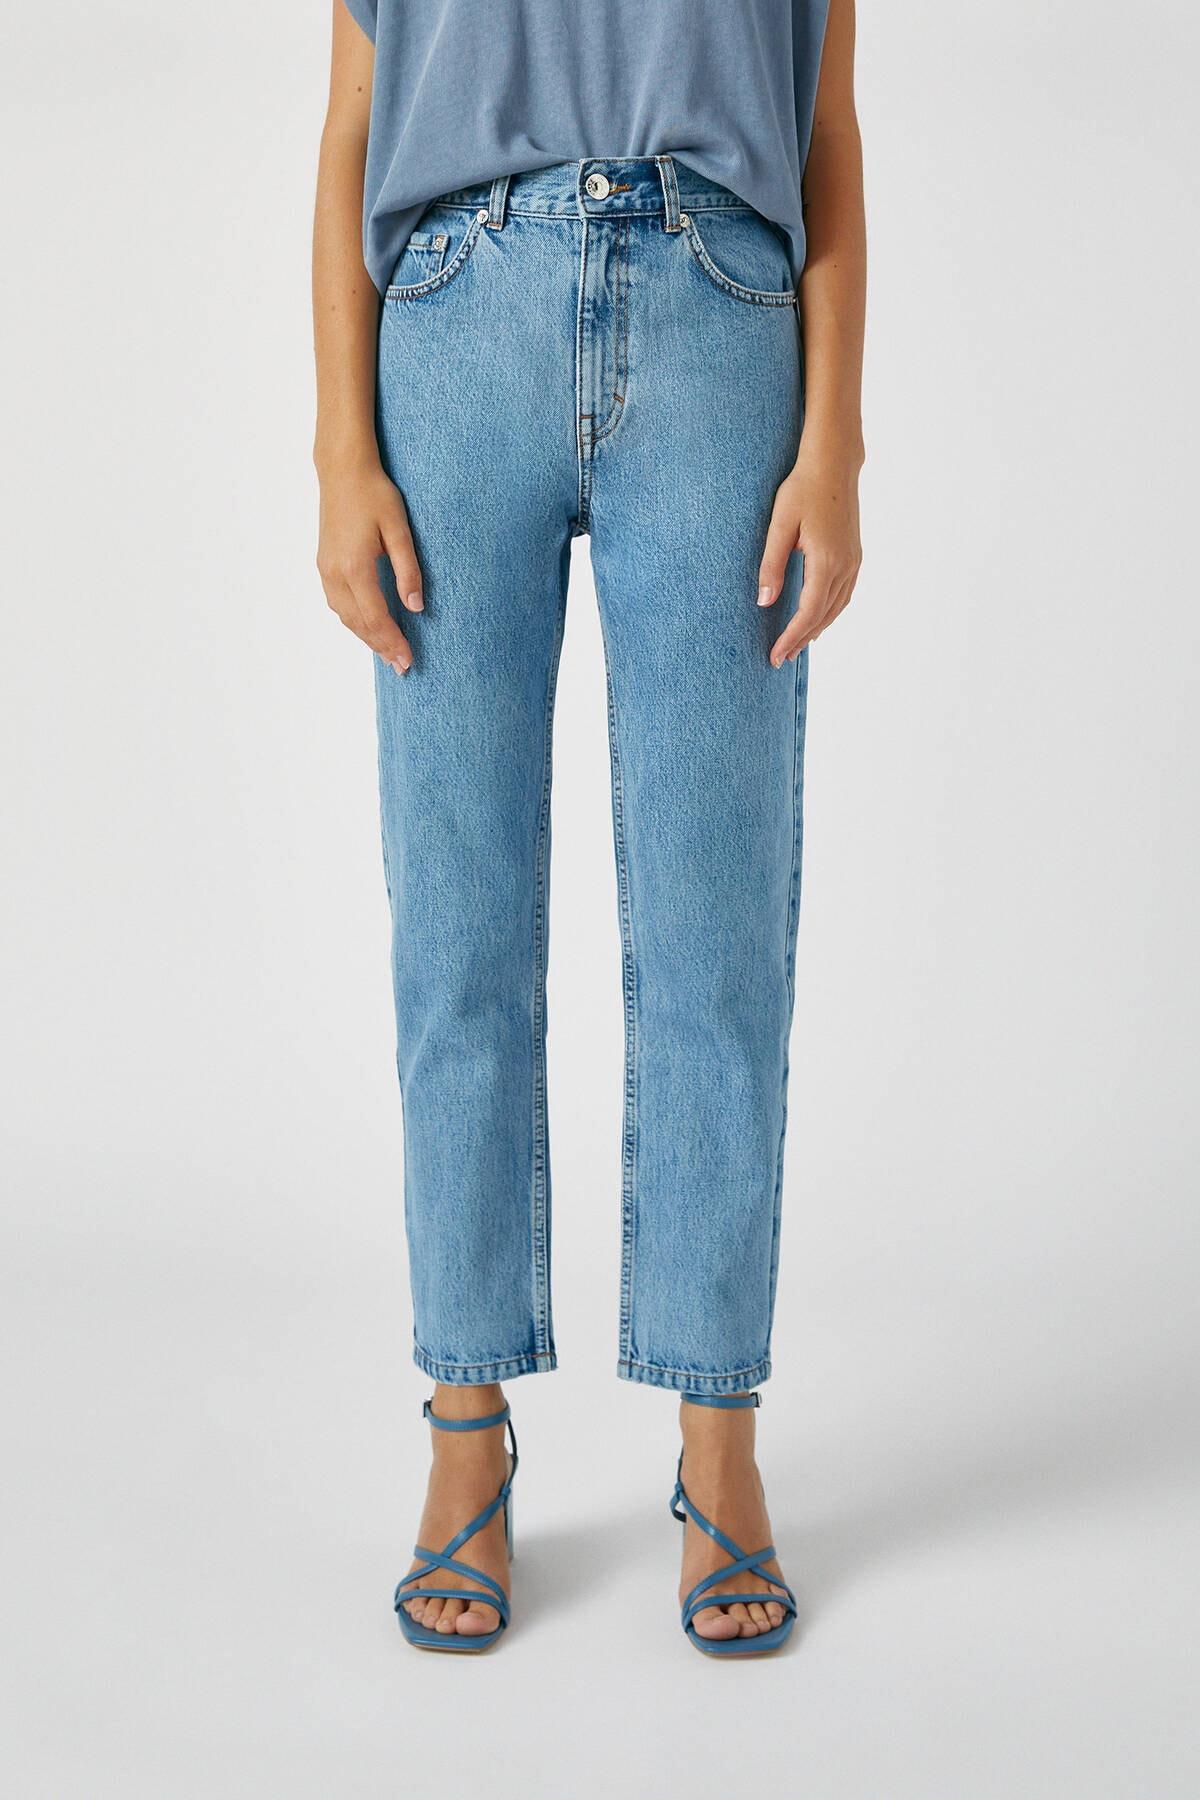 Pull & Bear Kadın Orta Mavi Basic Mom Fit Jean 09683320 1